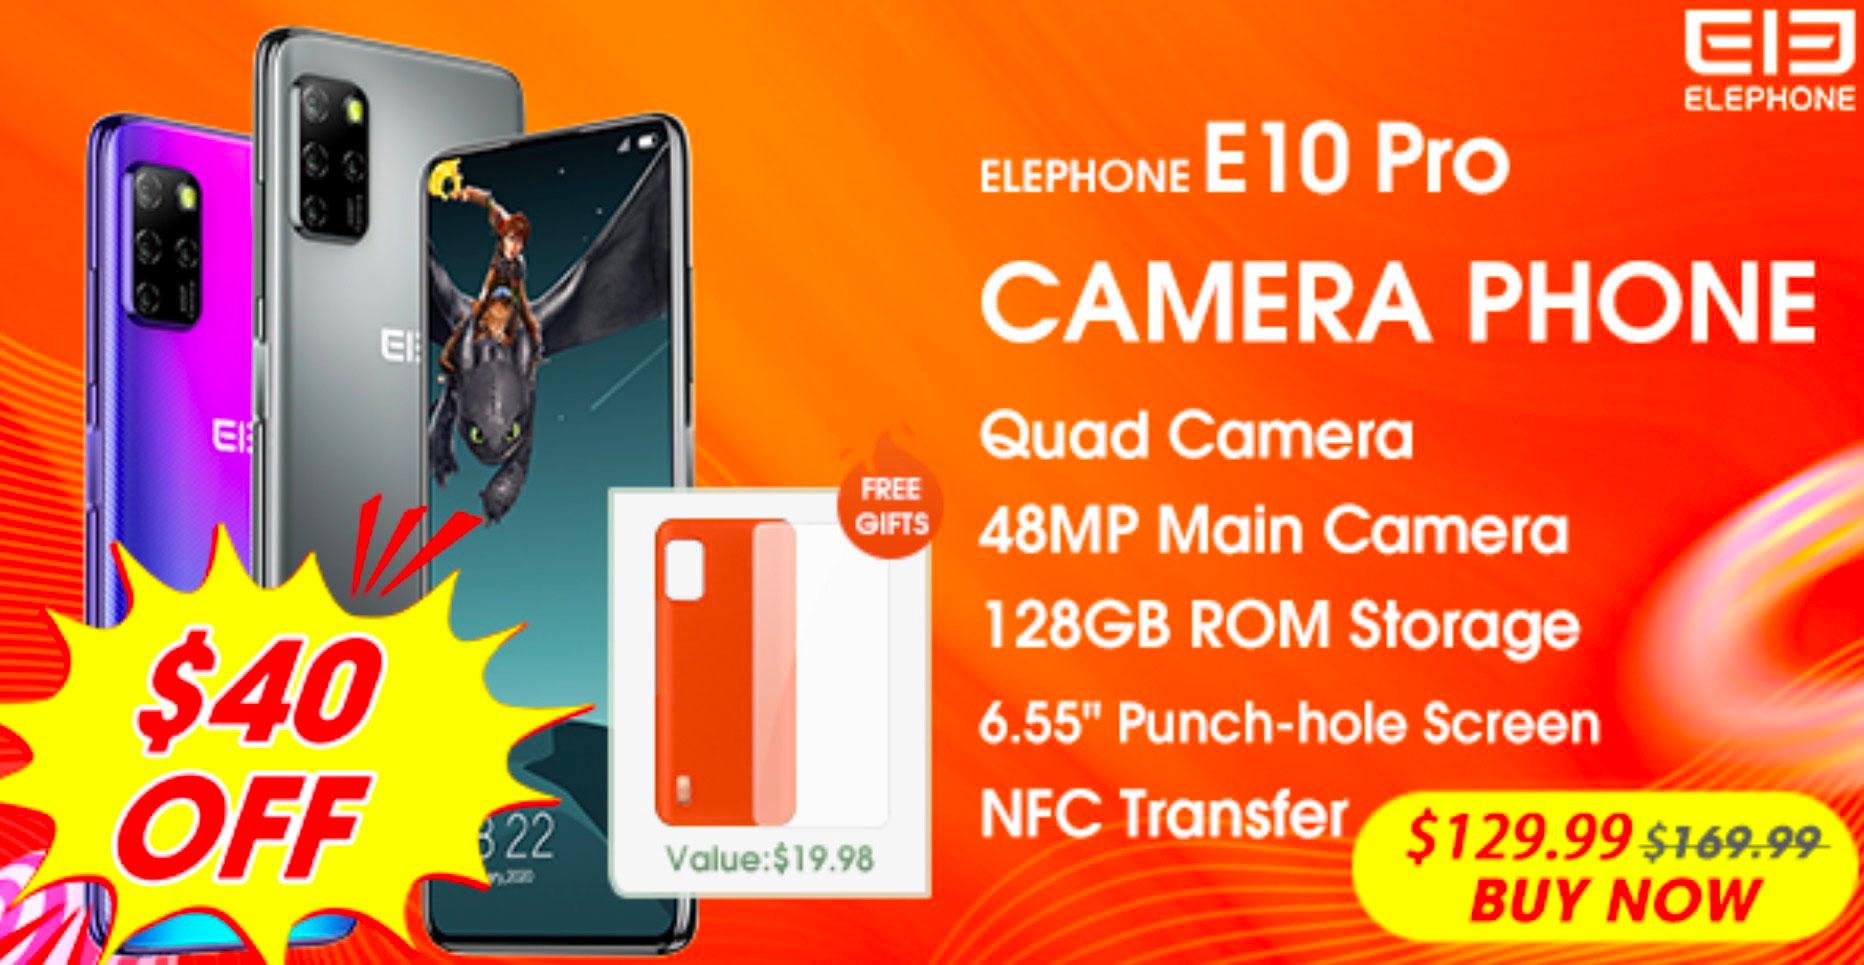 L'Elephone E10 Pro est en promo